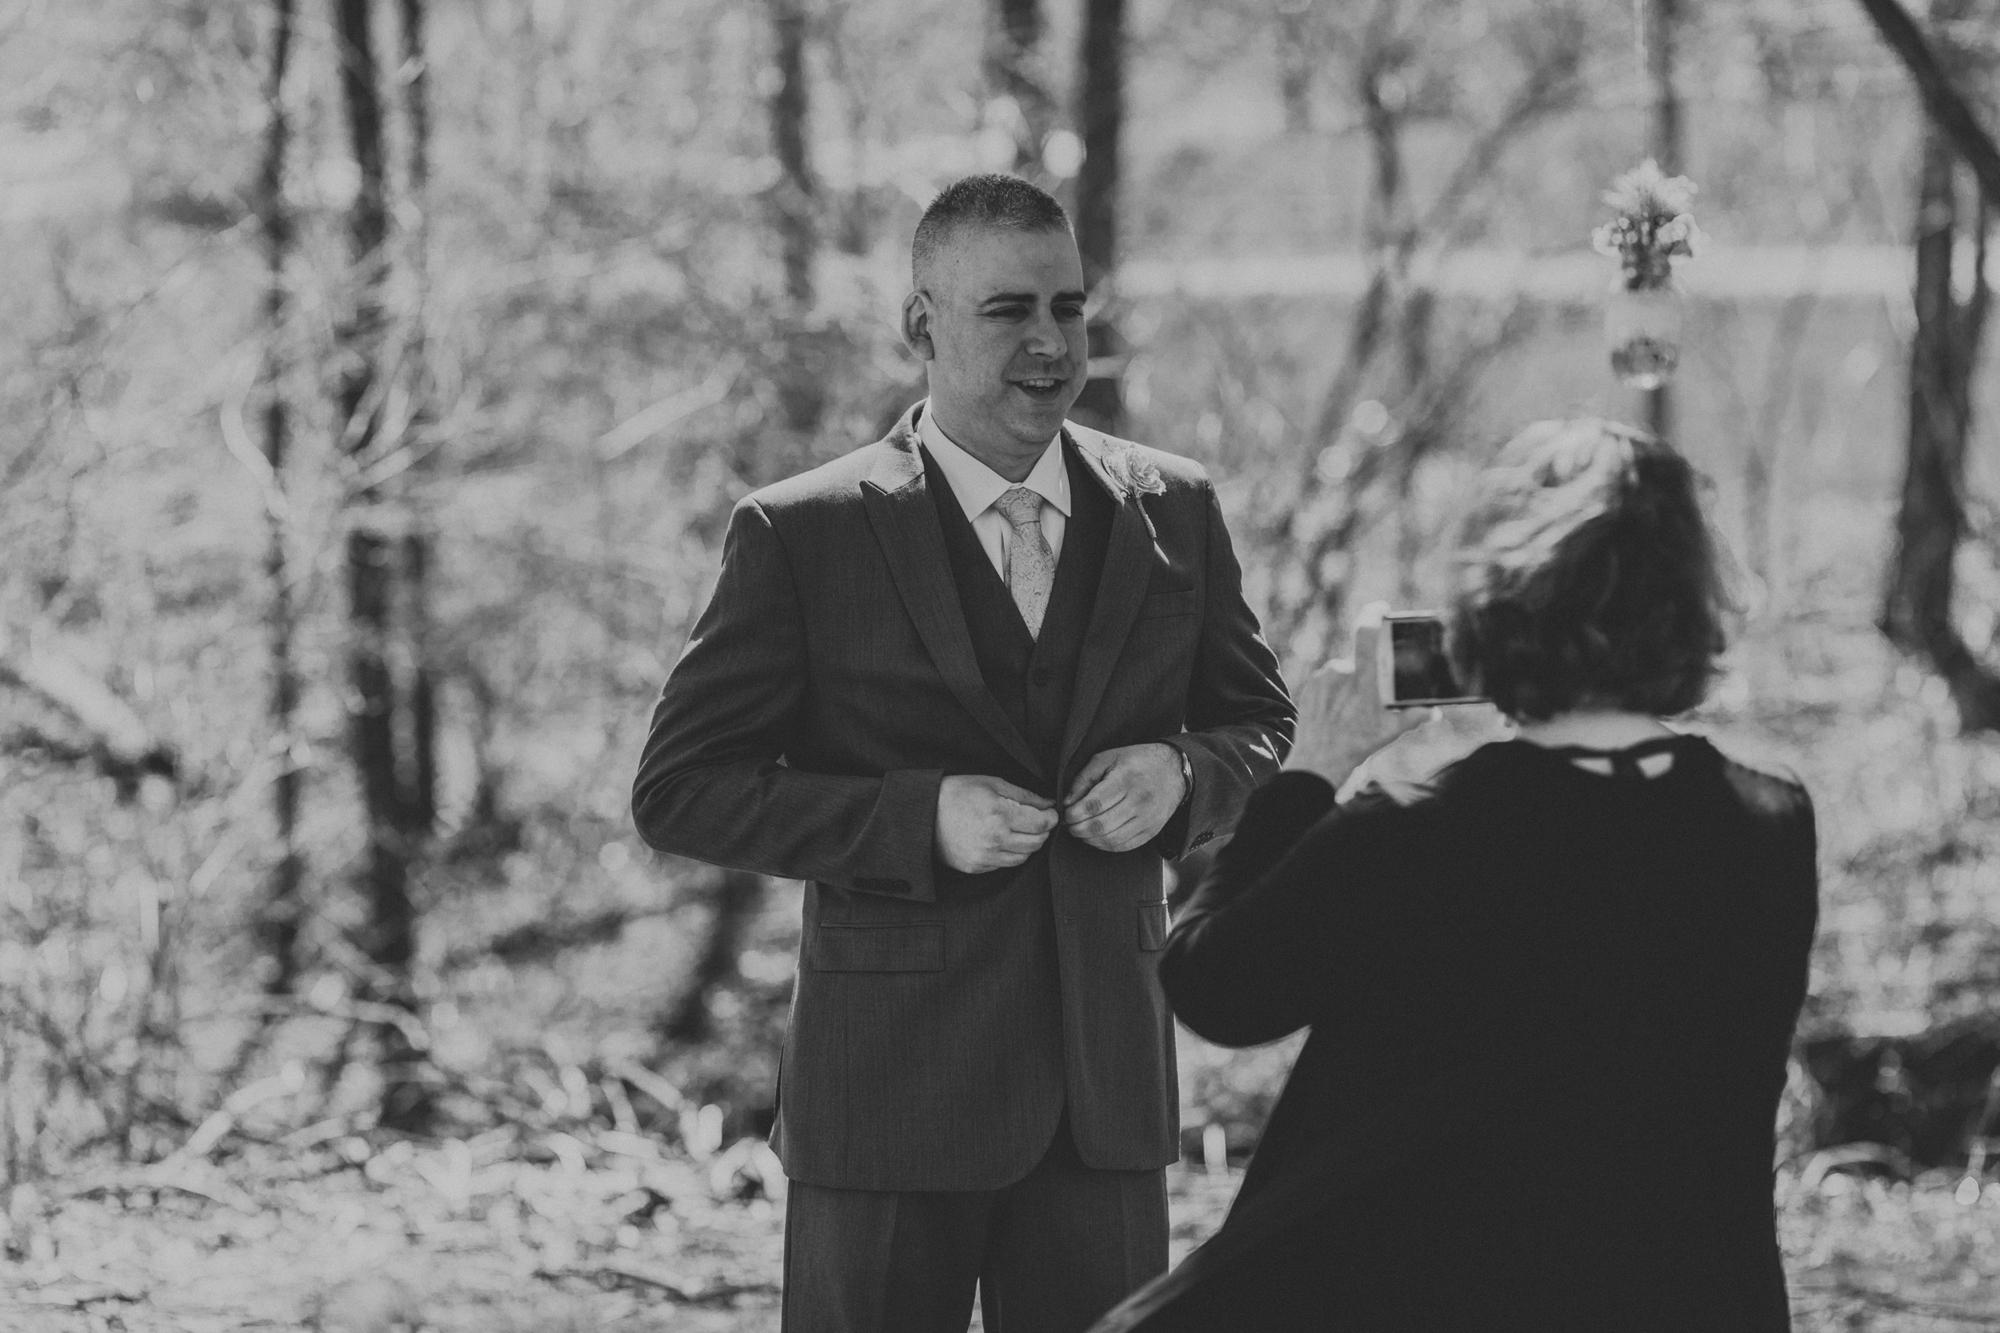 groom-getting-ready-before-wedding-palmer-pennsylvania